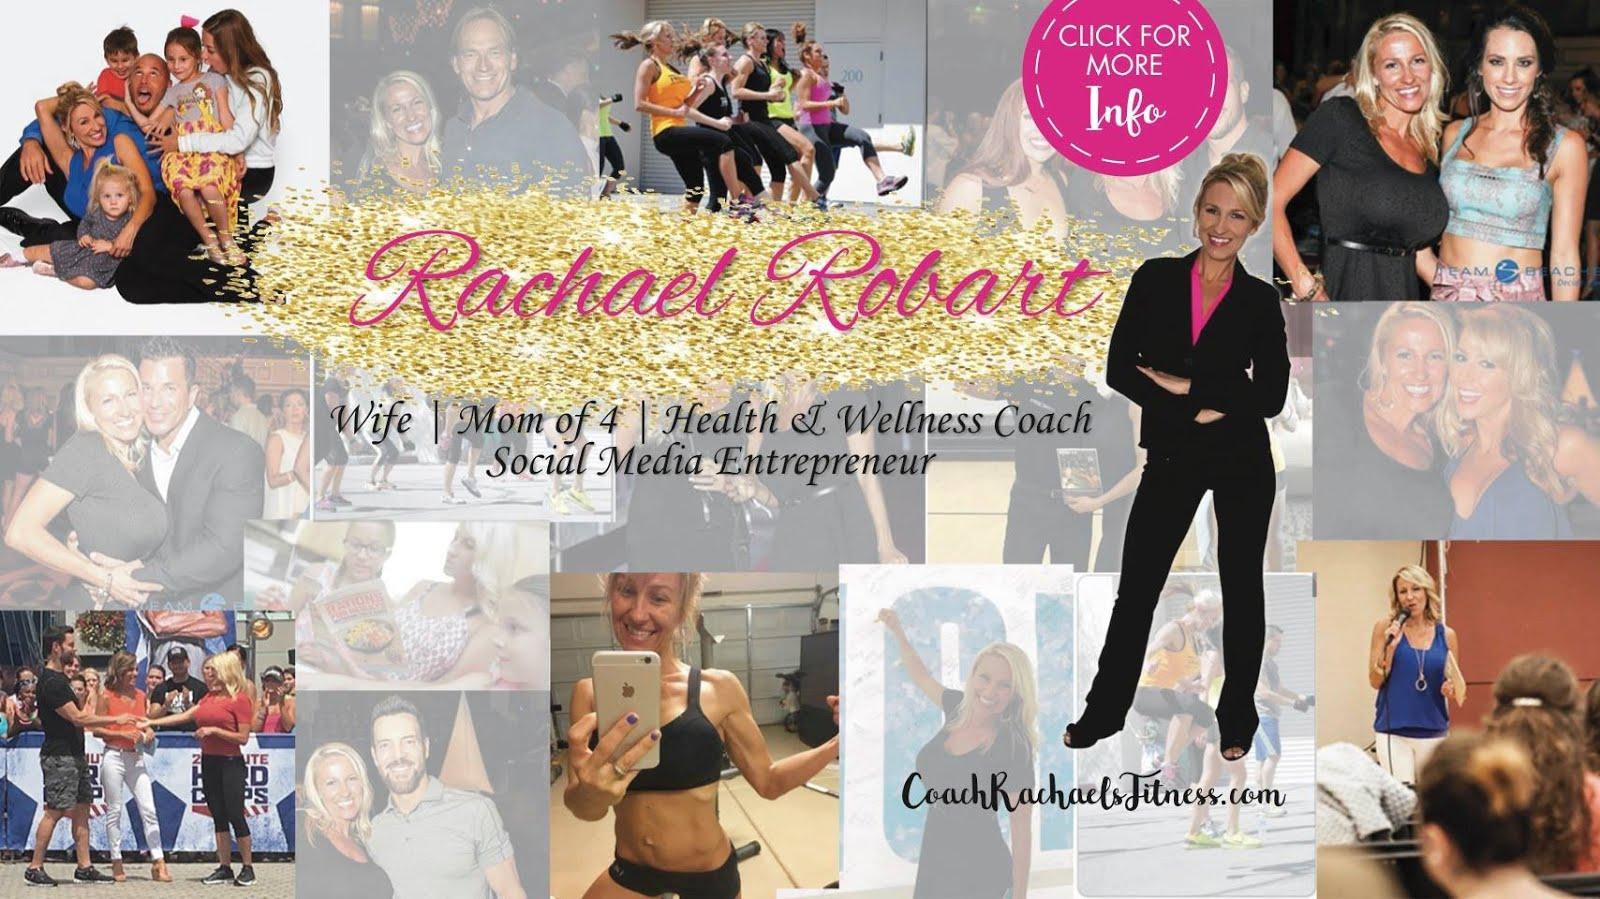 Coach Rachael's Fitness